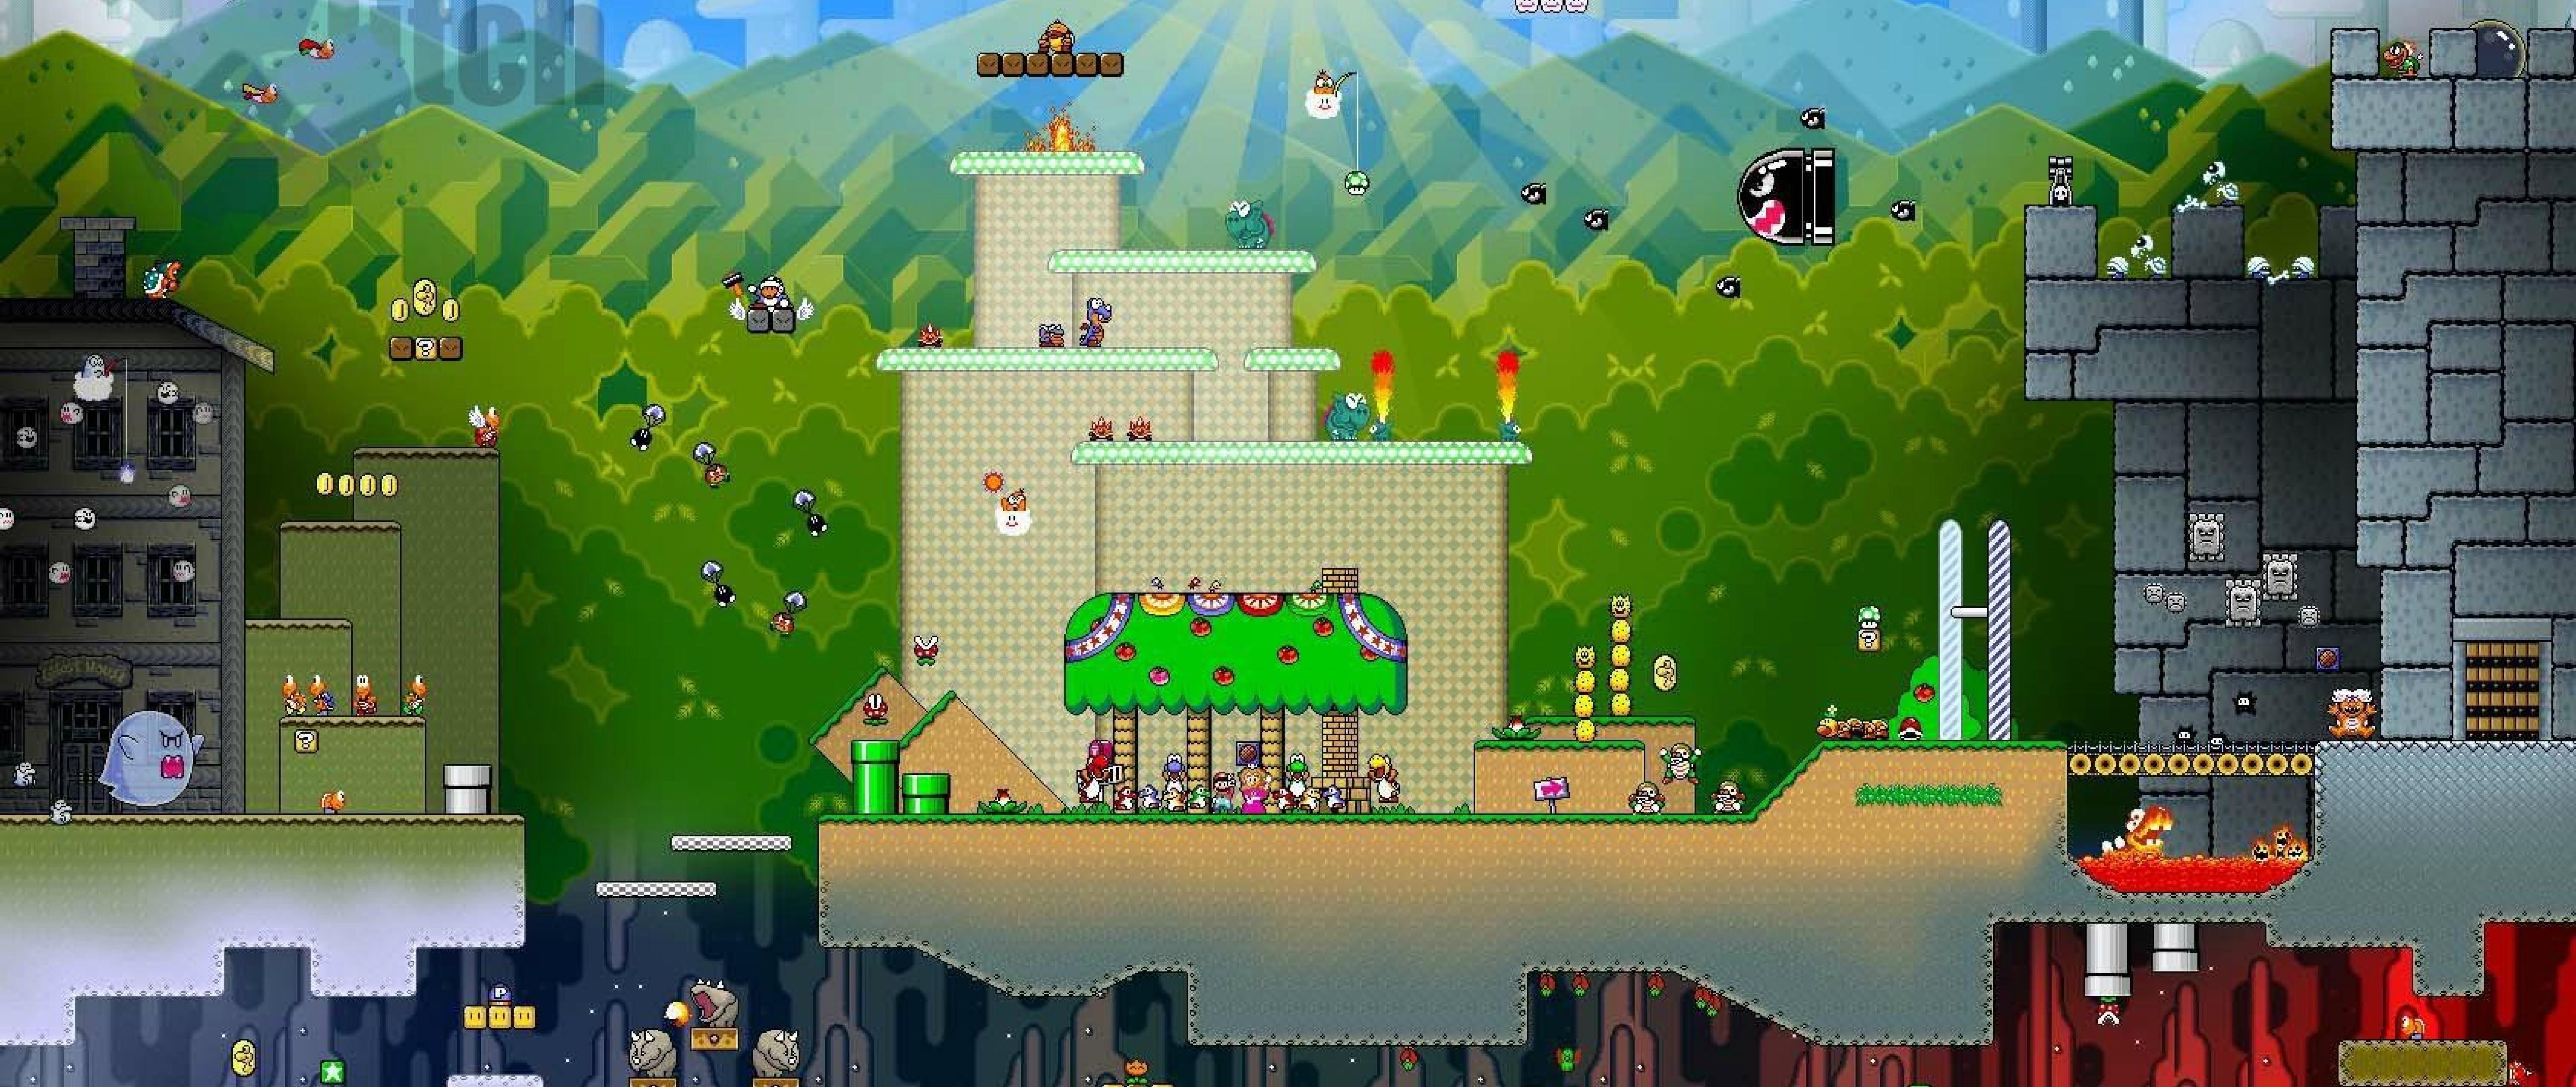 Super Mario World Remake Hd Wallpaper 4k Ultra Hd Wide Tv